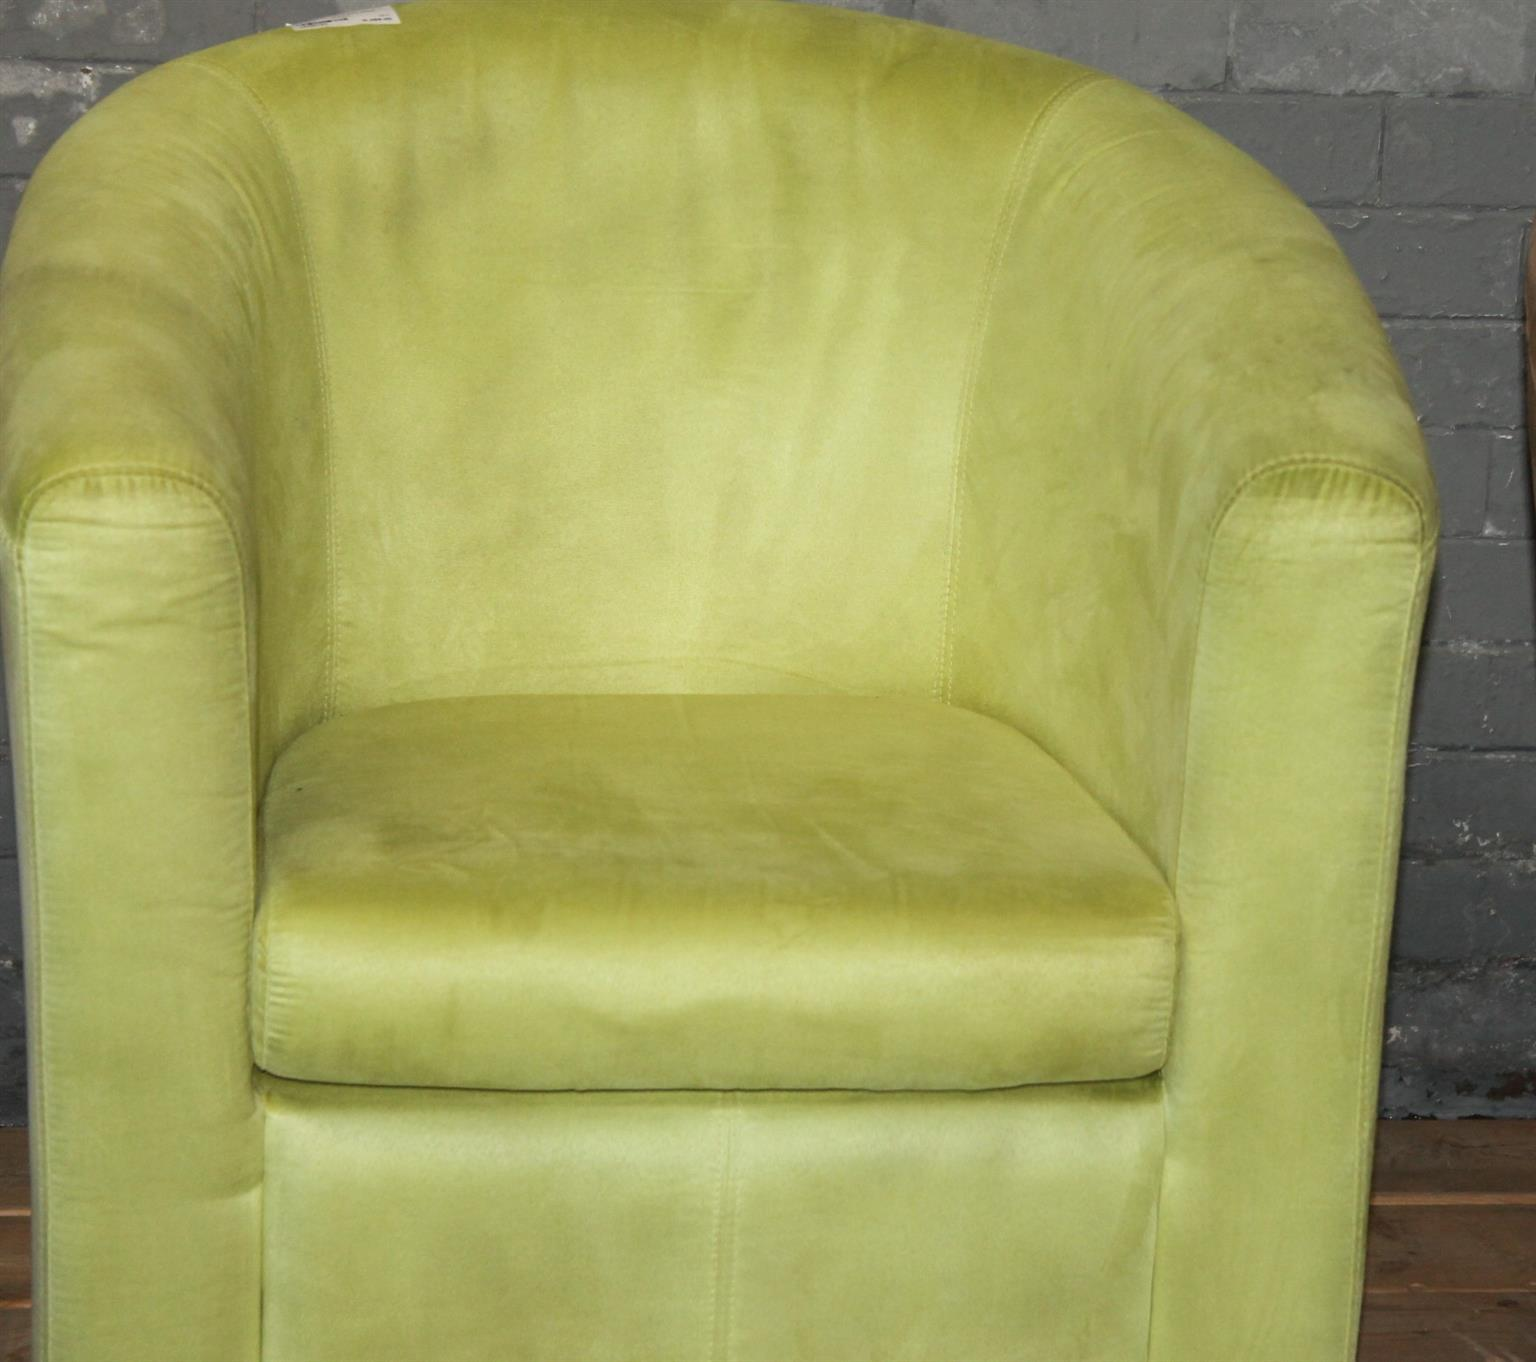 Chairs s028019c #Rosettenvillepawnshop